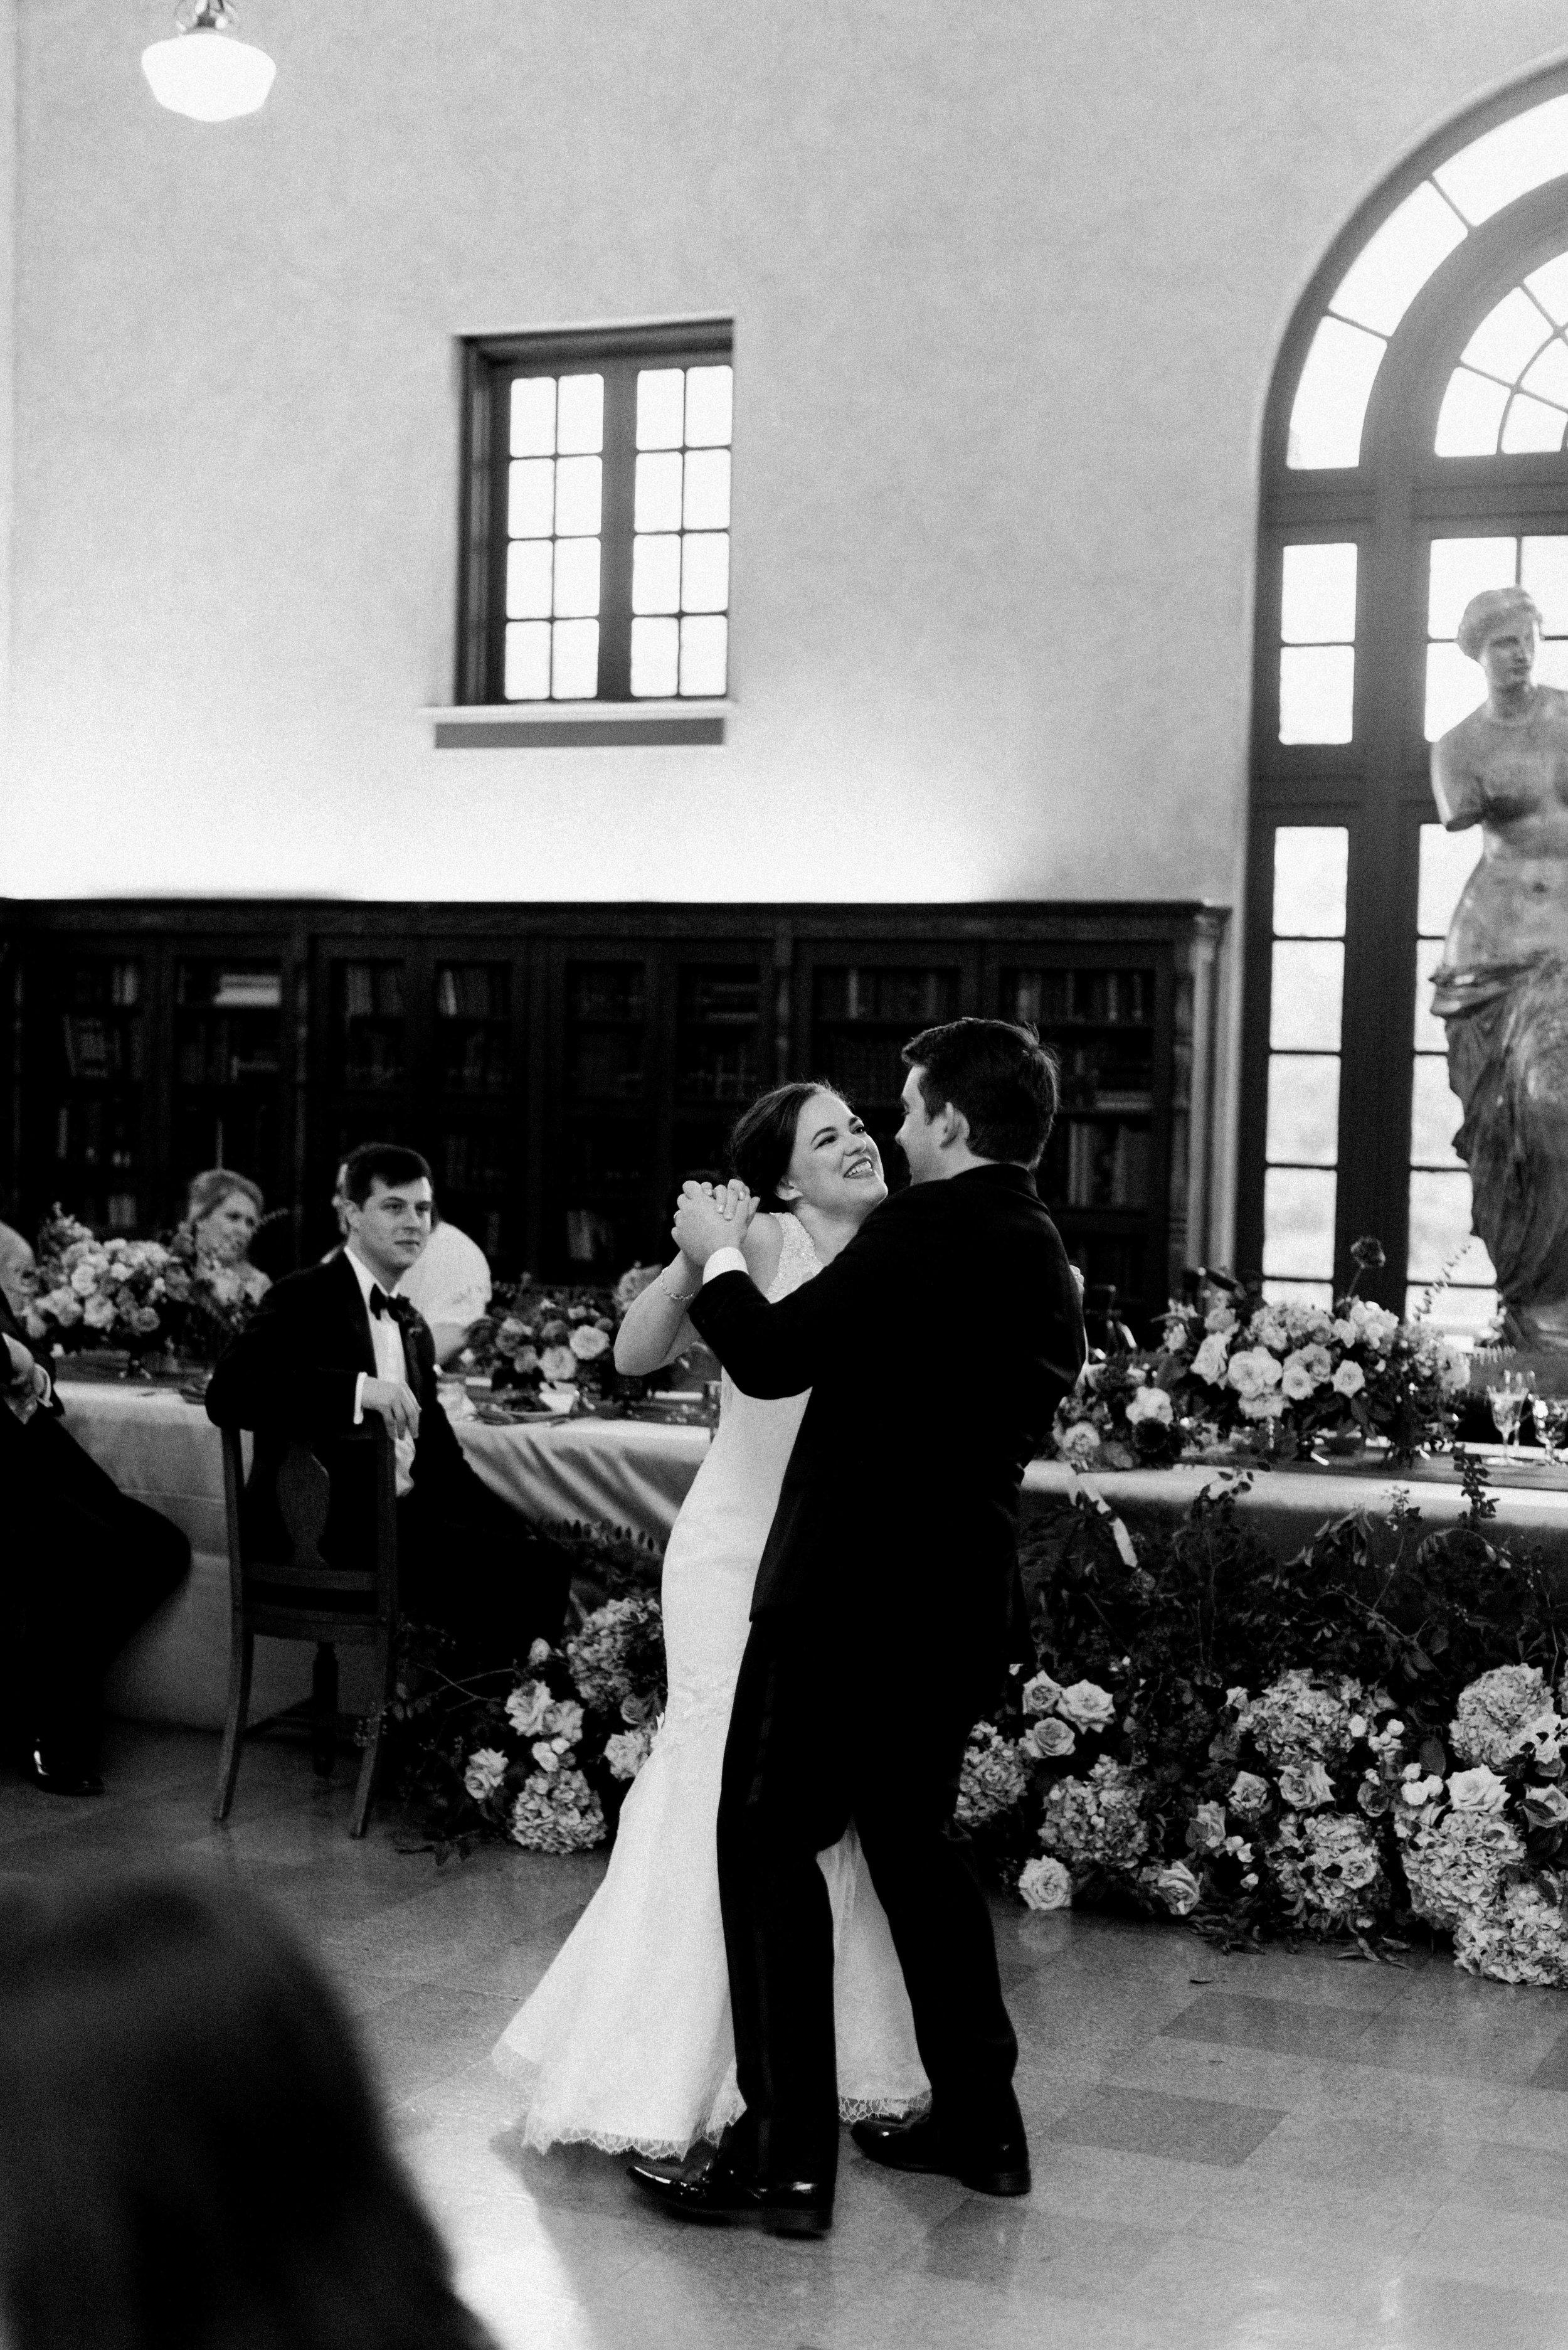 The-Knot-Texas-Fine-Art-Wedding-Film-Destination-Photographer-Houston-Austin-Dallas-New-Orleans-Julia-Ideson-Library-Event-Dana-Josh-Fernandez-Photograph-Top-Best-81.jpg